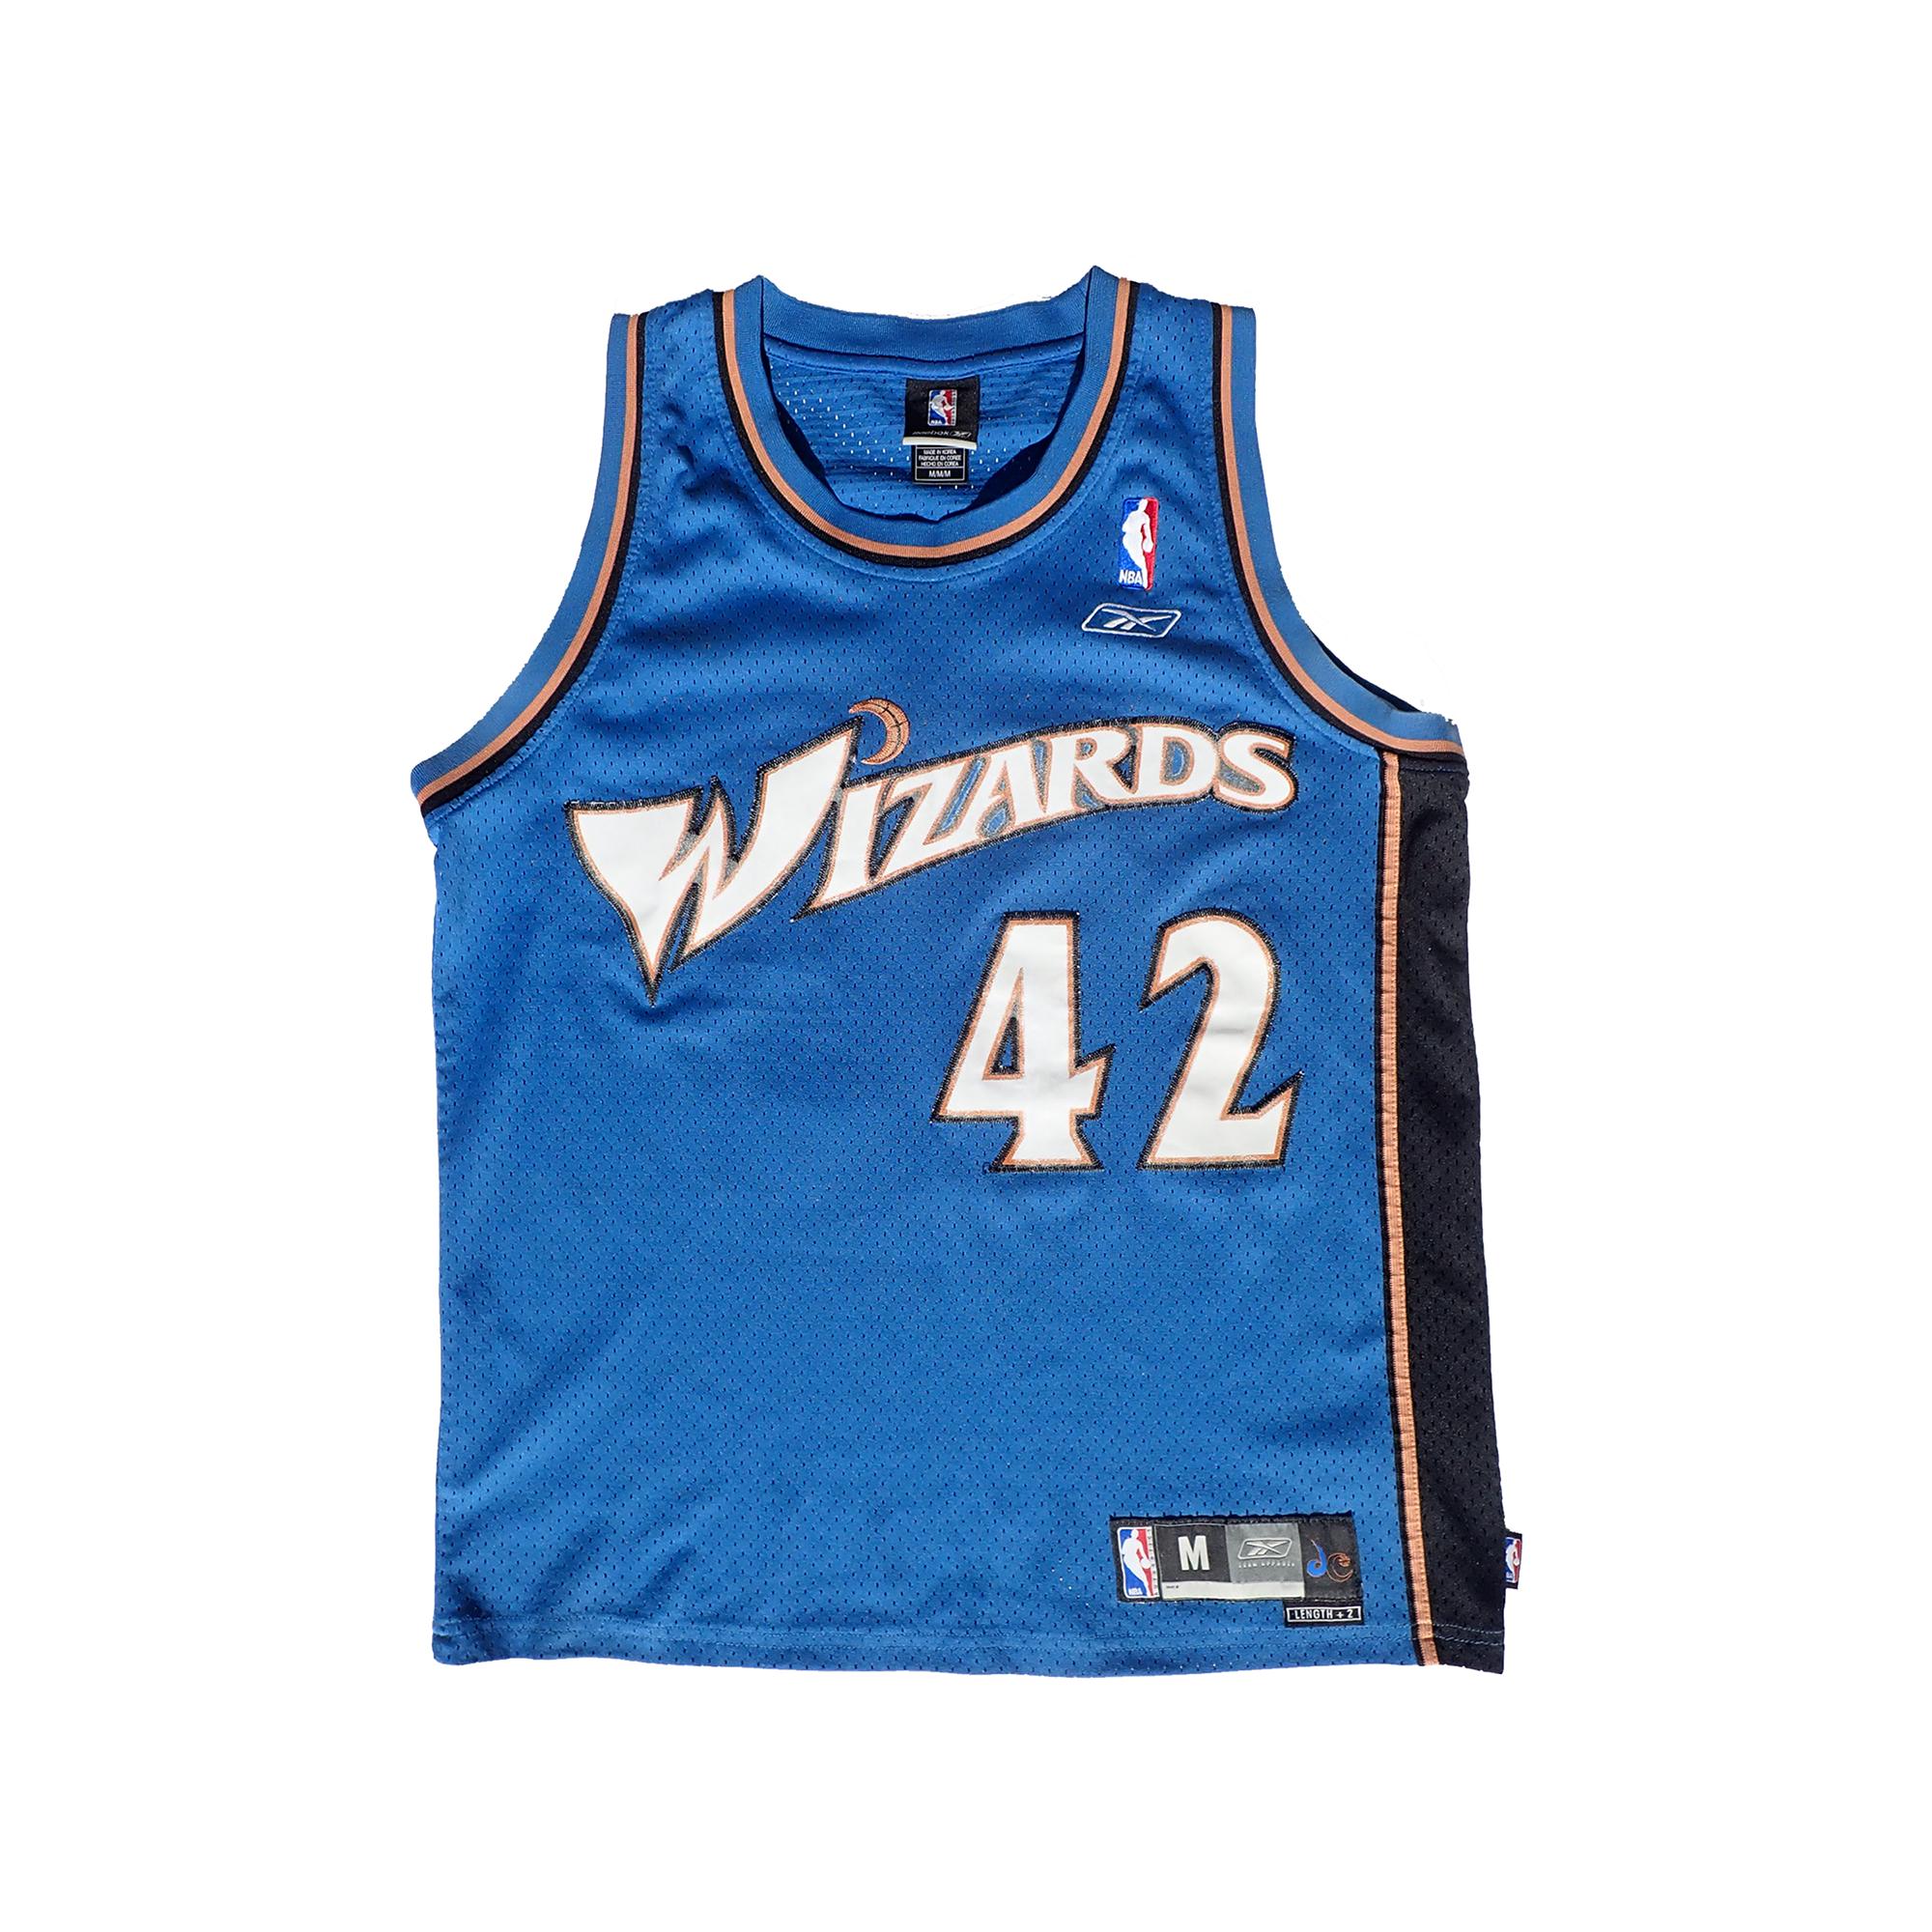 Reebok NBA Washingtion Wizards Jersey